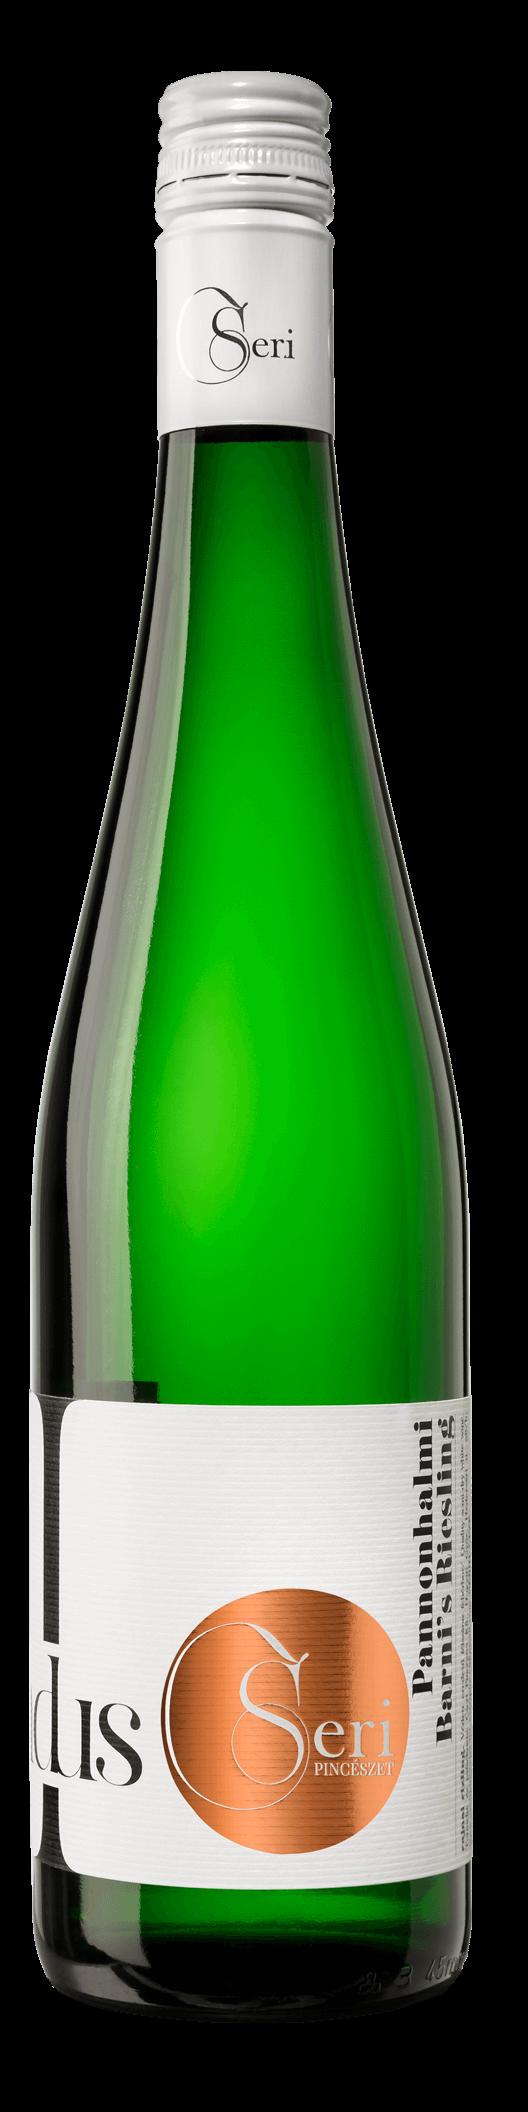 II. Secundus Barni's Riesling -  Cseri Pincészet